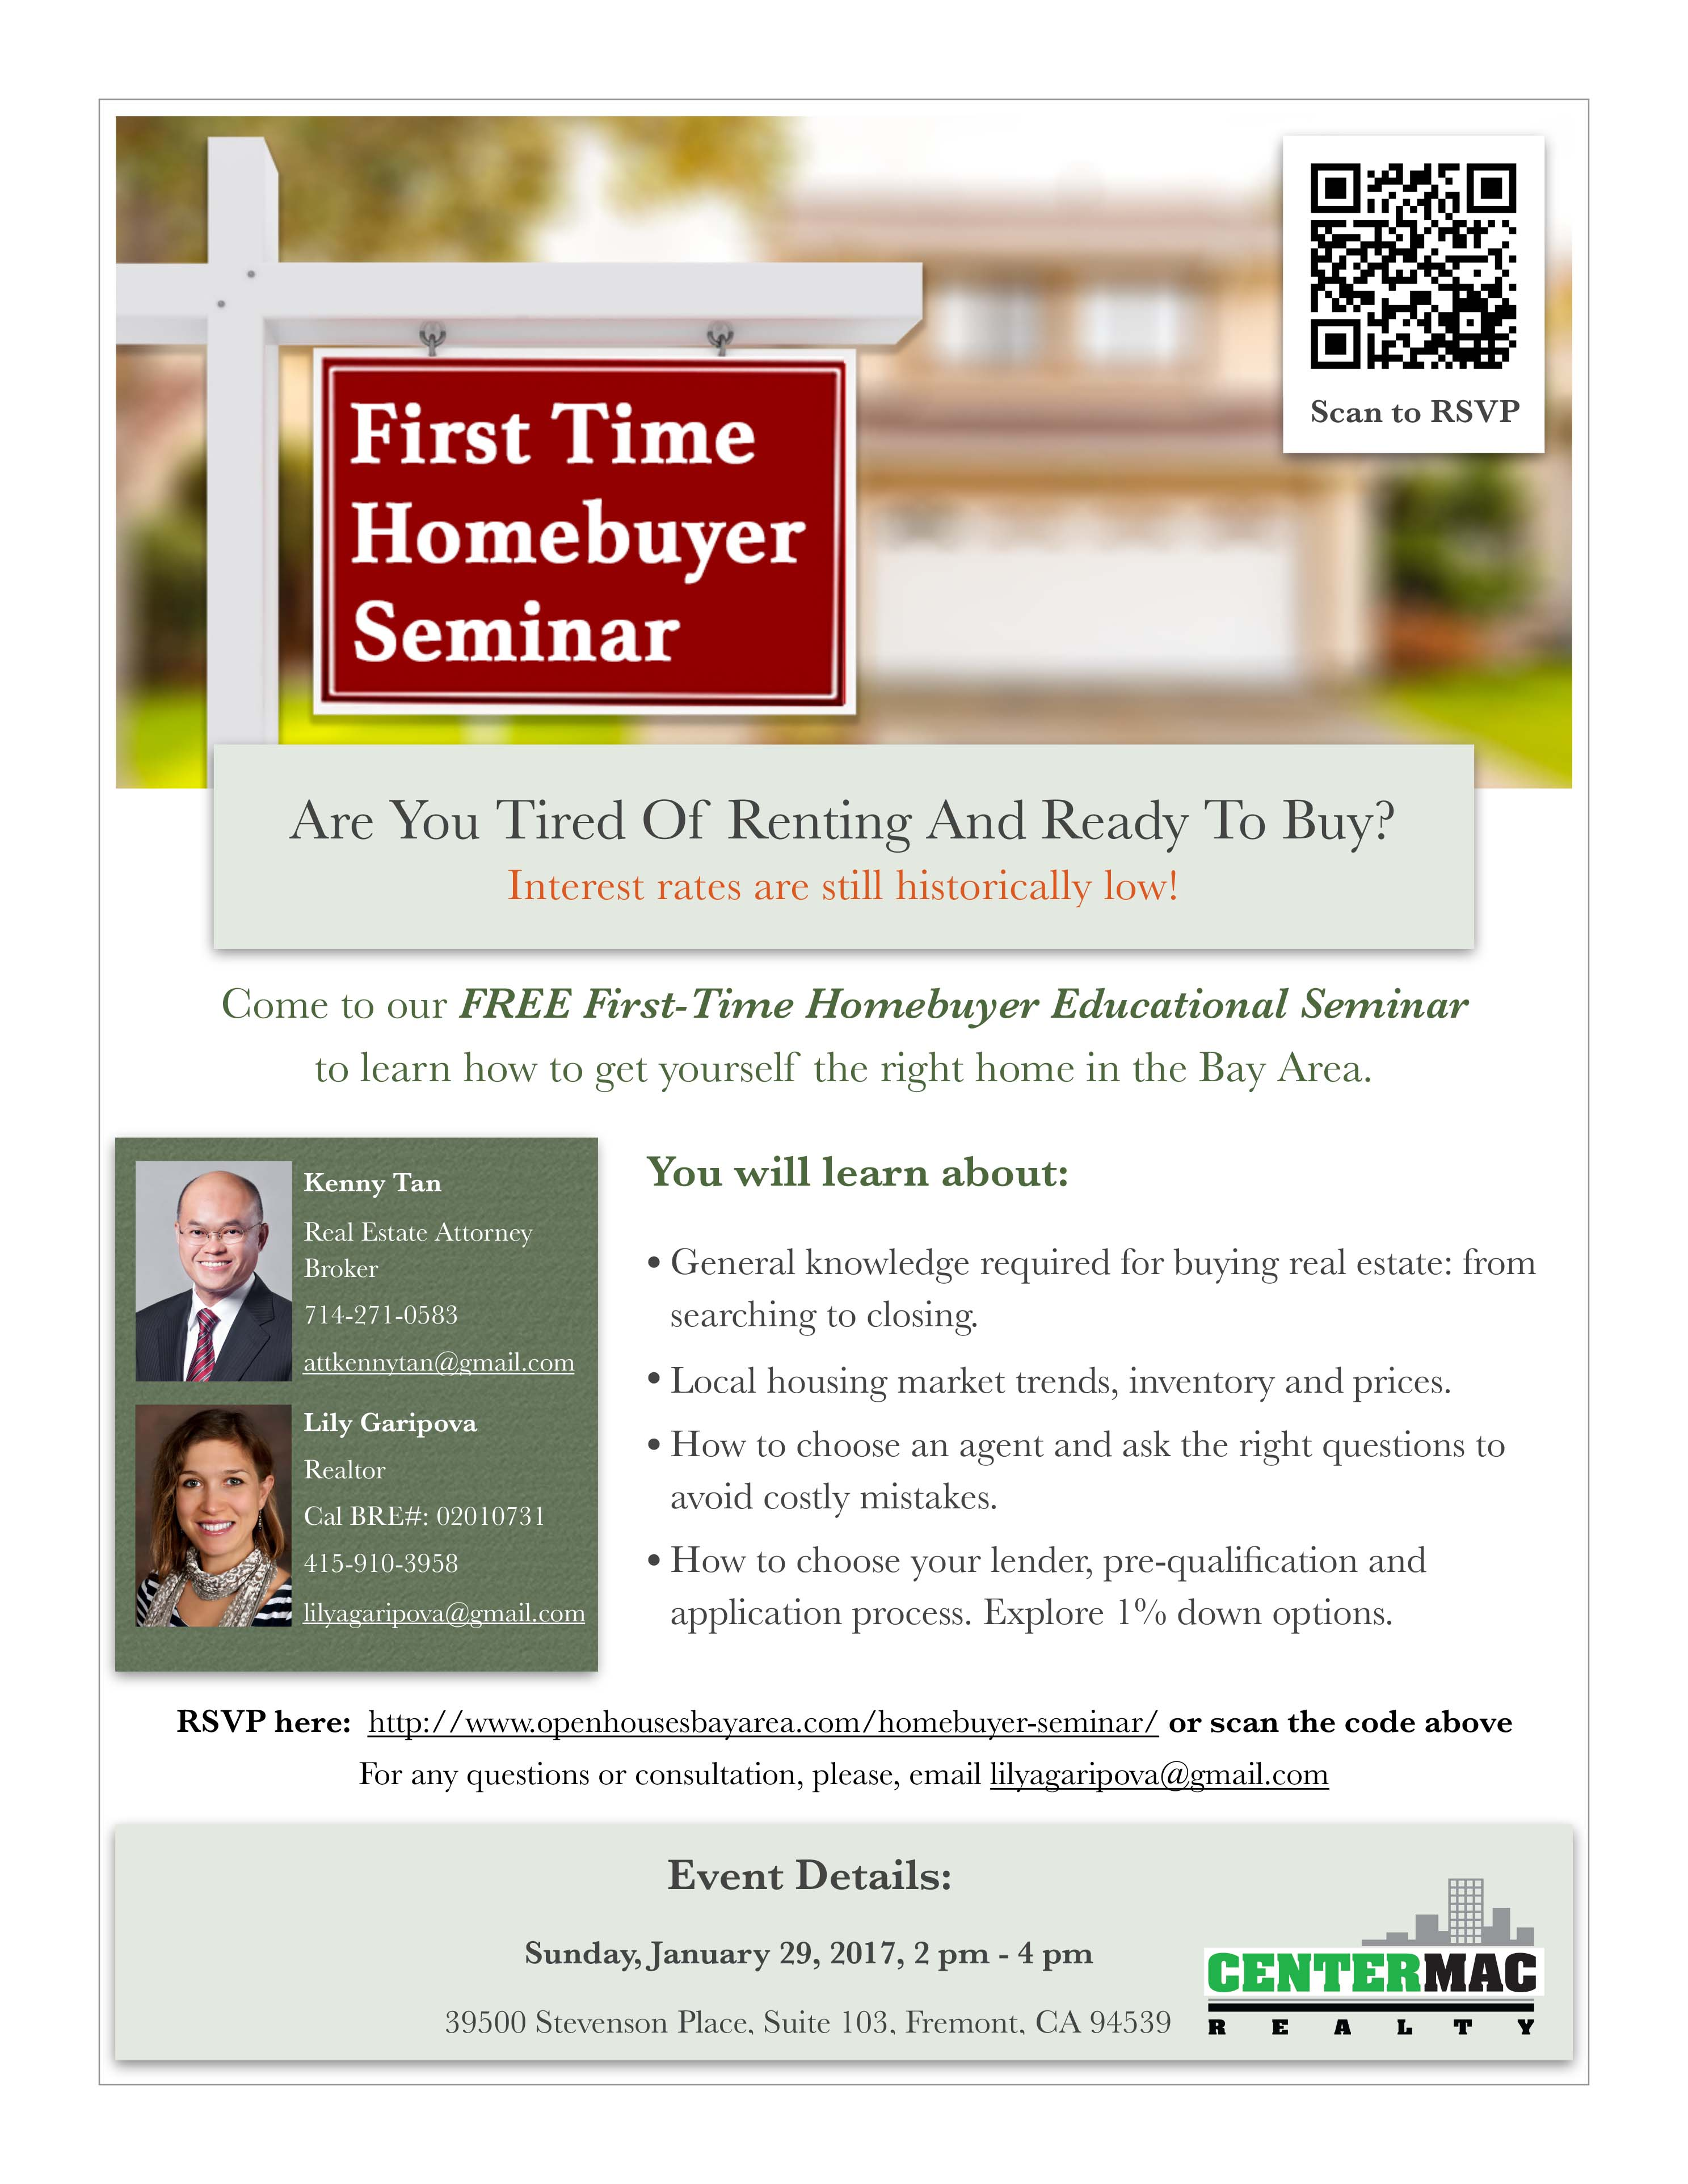 Fremont: First-Time Homebuyer Seminar Tickets, Sun, Jan 29, 2017 ...